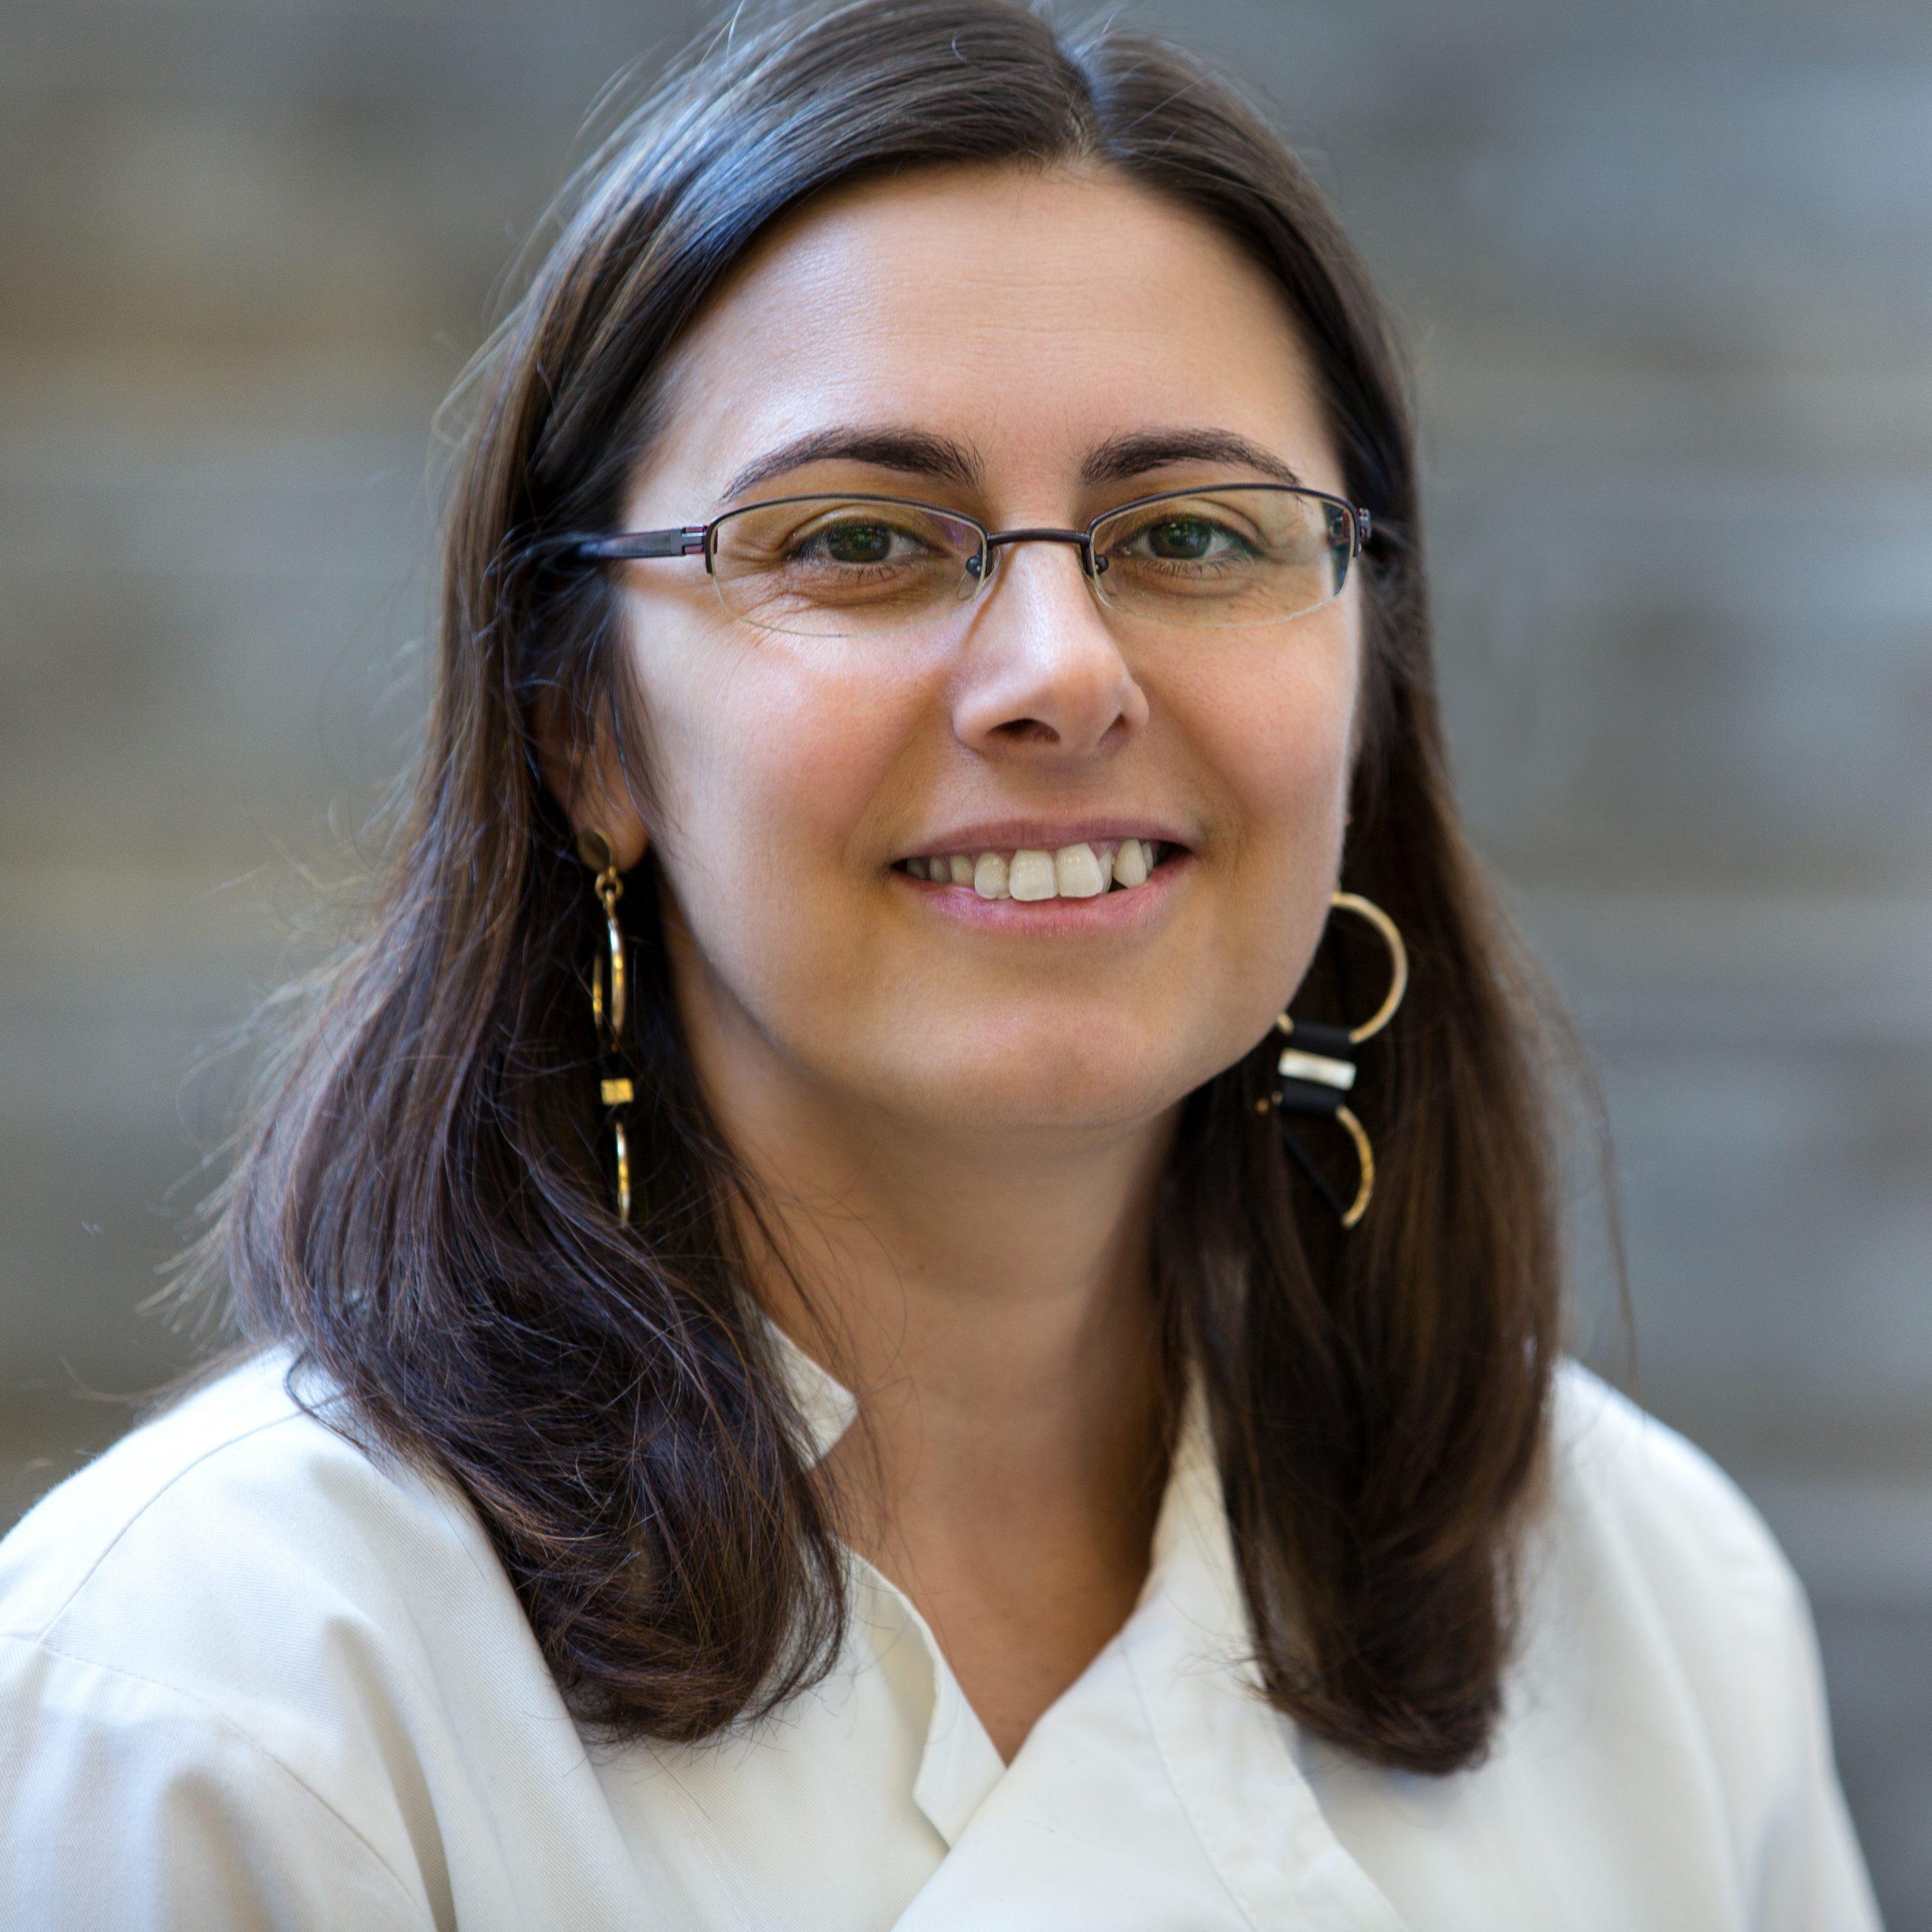 Sonia Santos (Responsavel Area Citogenetica)